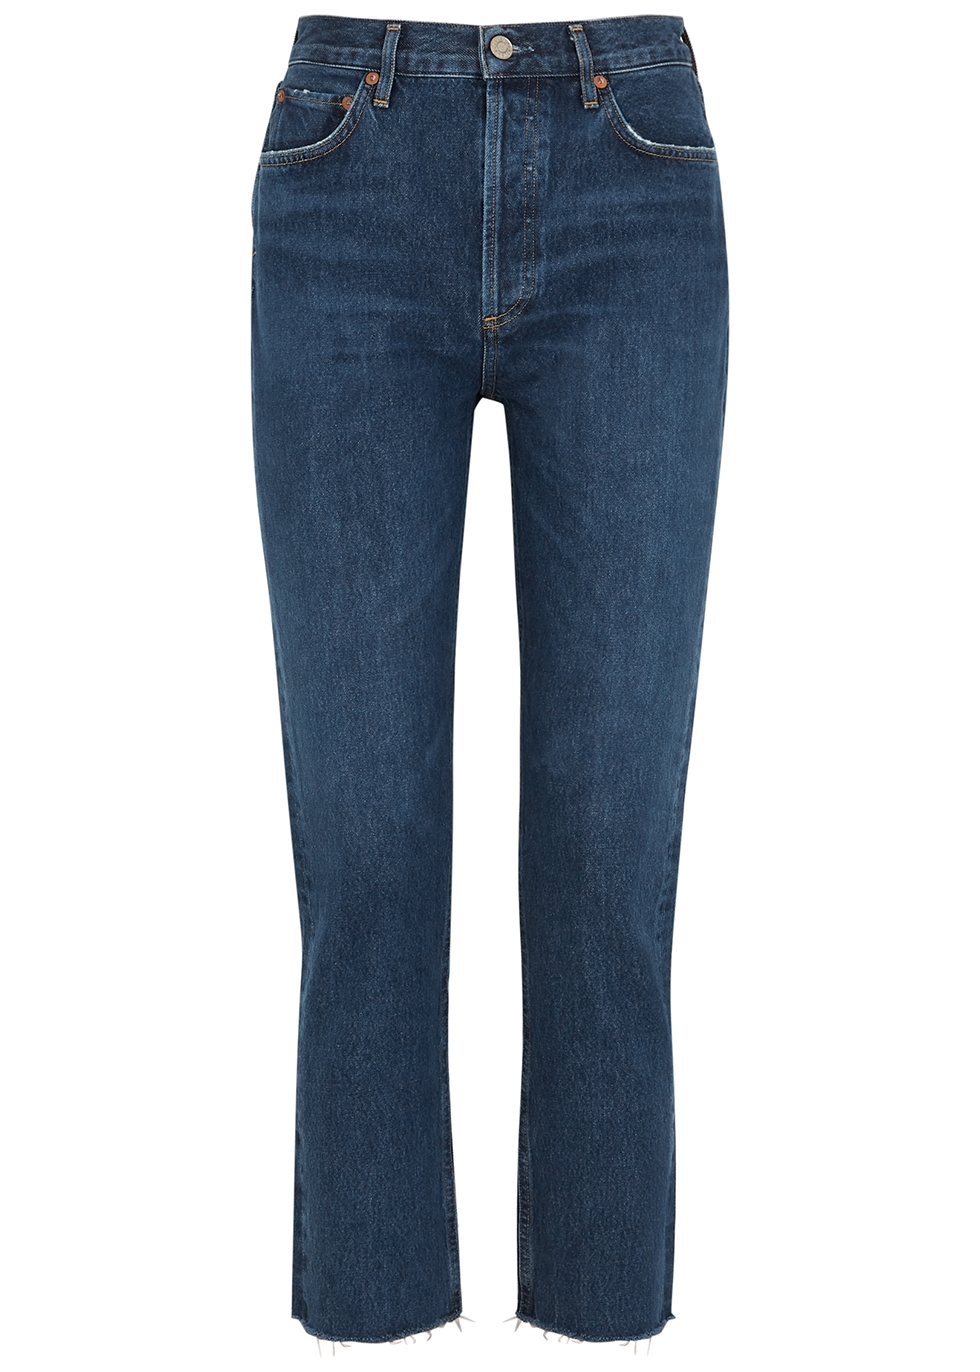 Remy blue straight-leg jeans